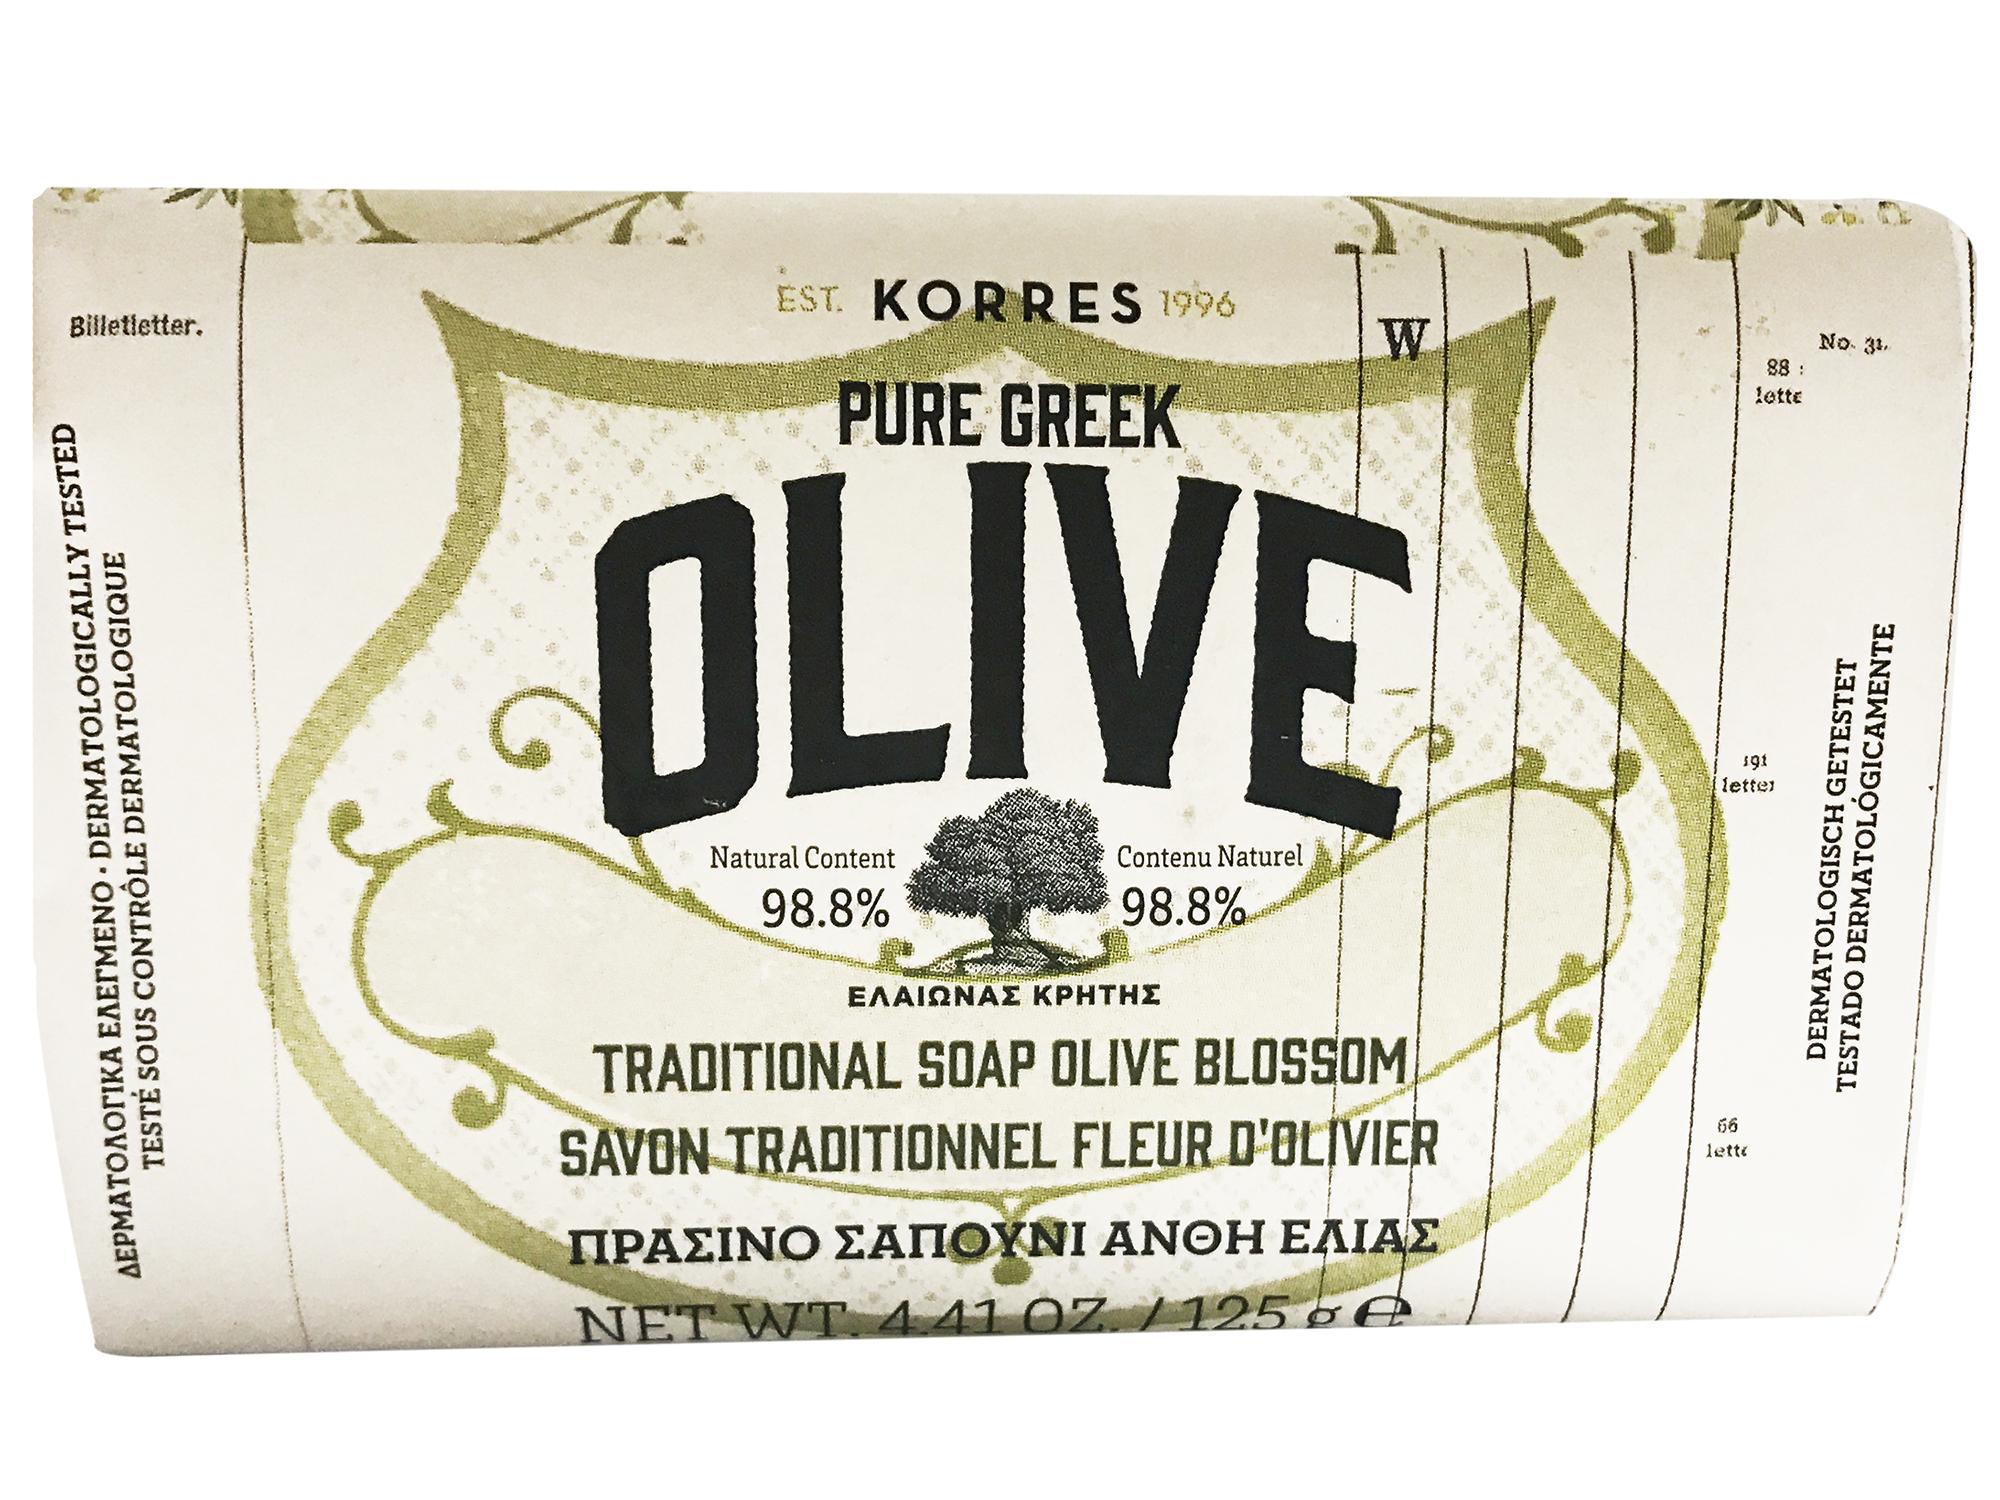 Korres Pure Greek Olive Tradional Soap Olive Blossom Πράσινο Σαπούνι Φυσική Πηγή Βιταμινών & Αντιοξειδωτικών με Άνθη Ελιάς 125gr